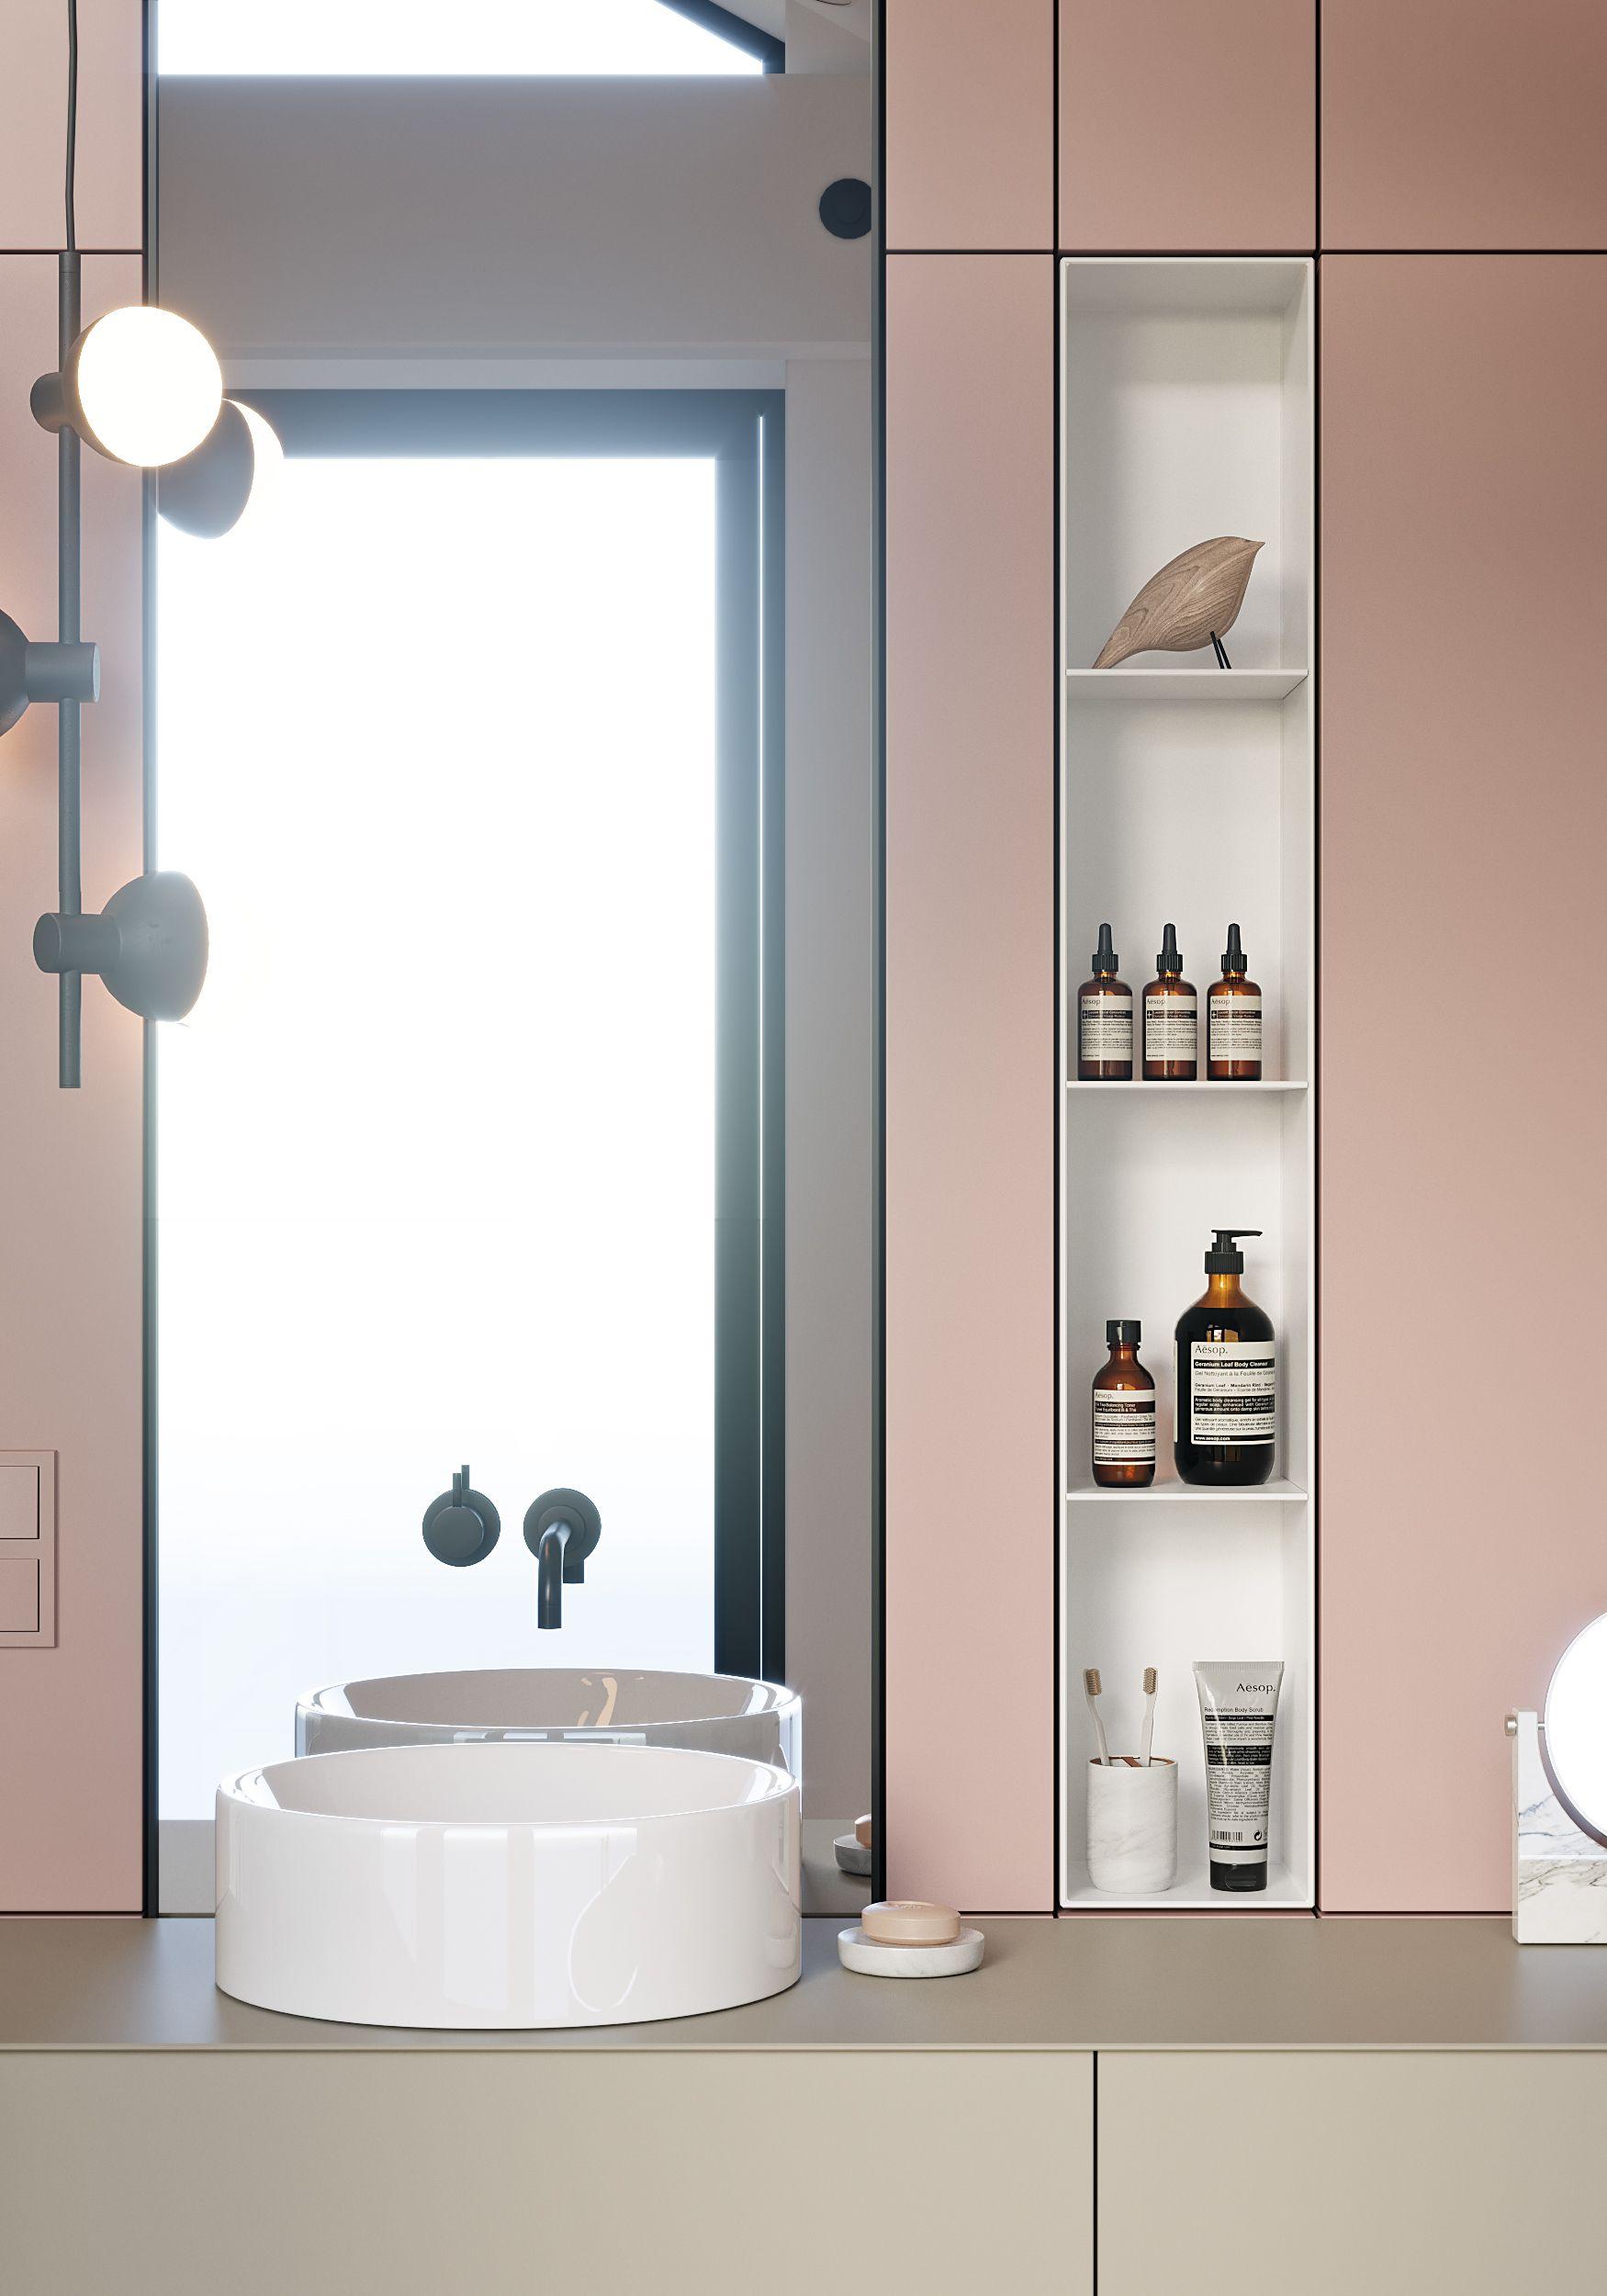 Pin van Saloua Aarab op • BATHROOM • | Pinterest - Wc, Badkamer en ...